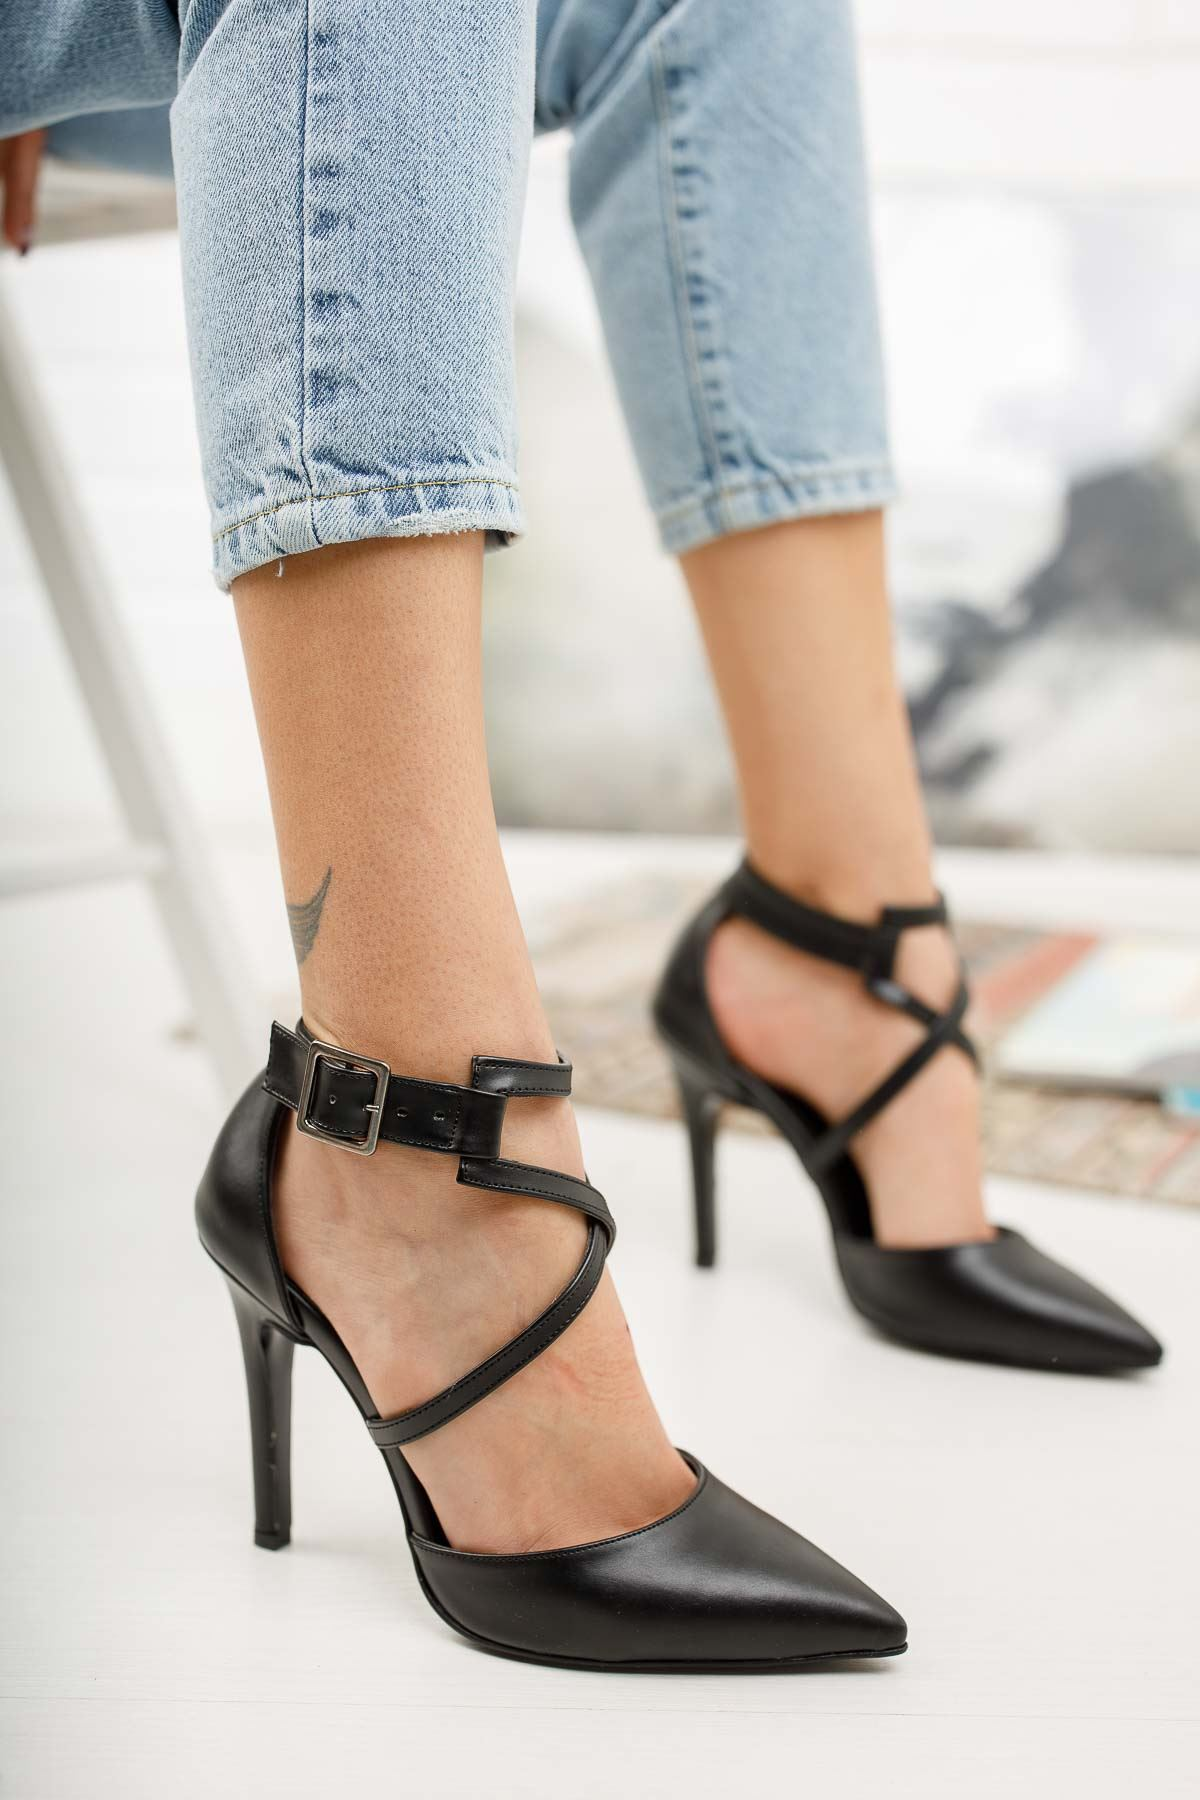 Edrie Siyah Cilt Topuklu Ayakkabı Stiletto